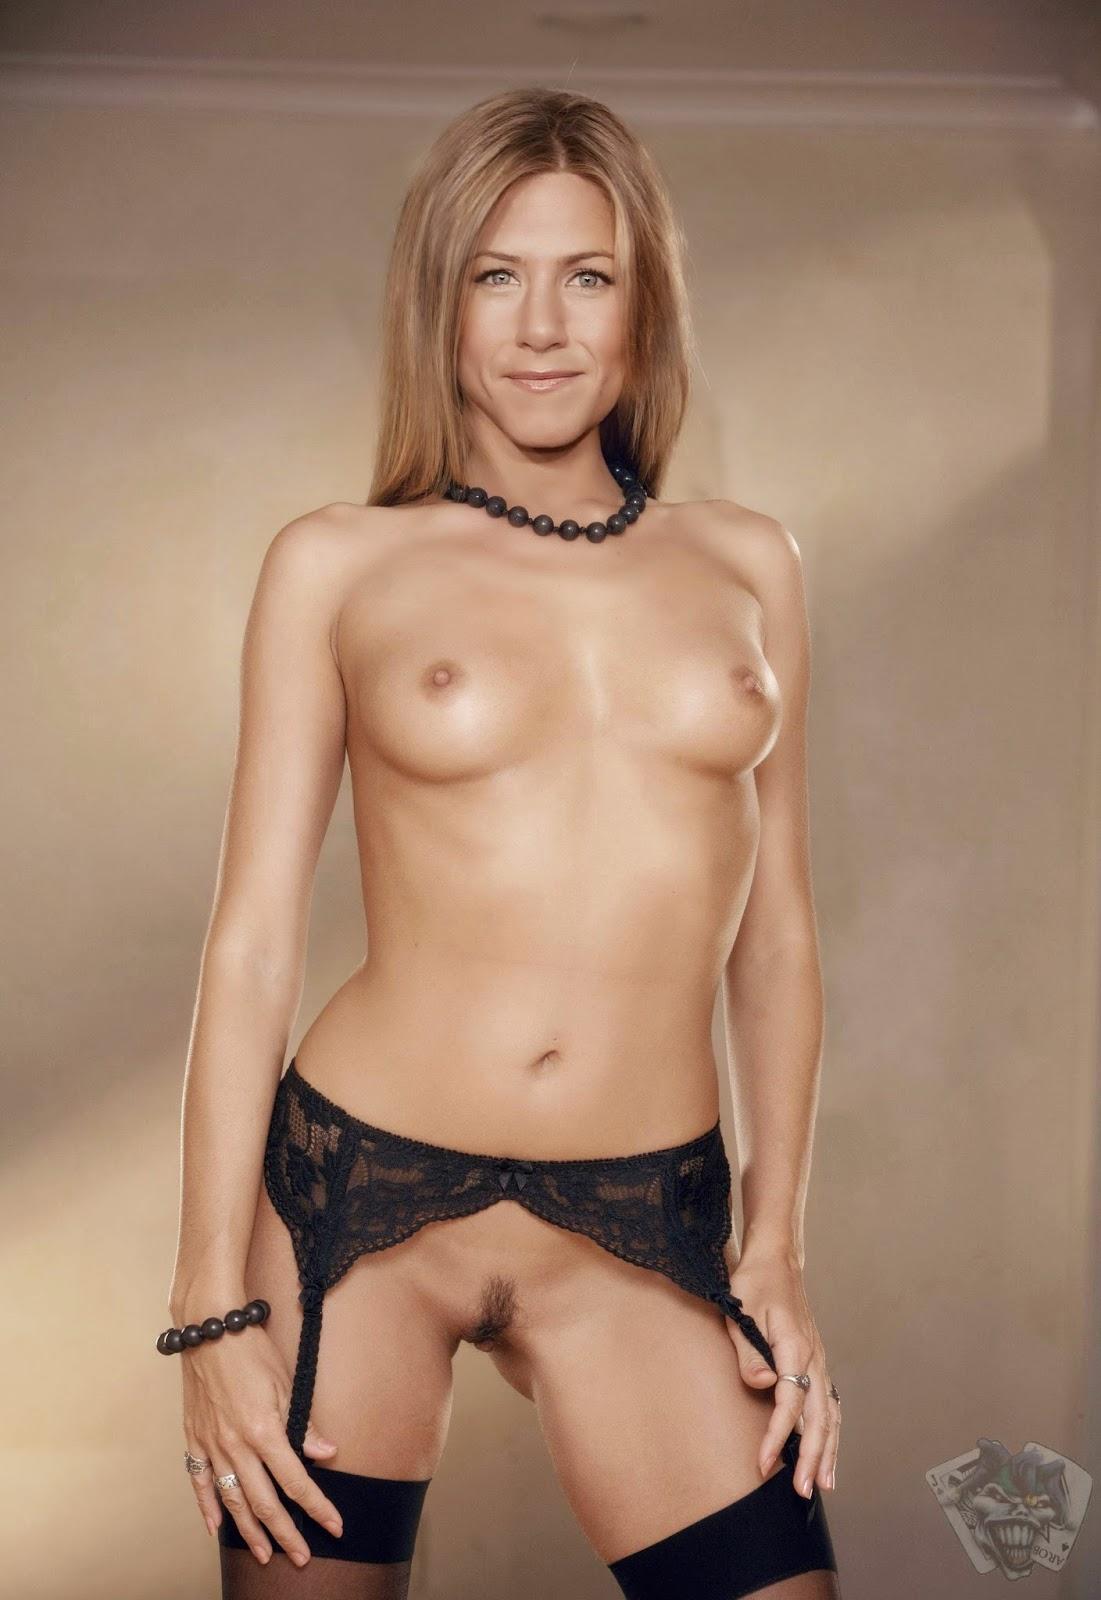 Nude celebrity galleries